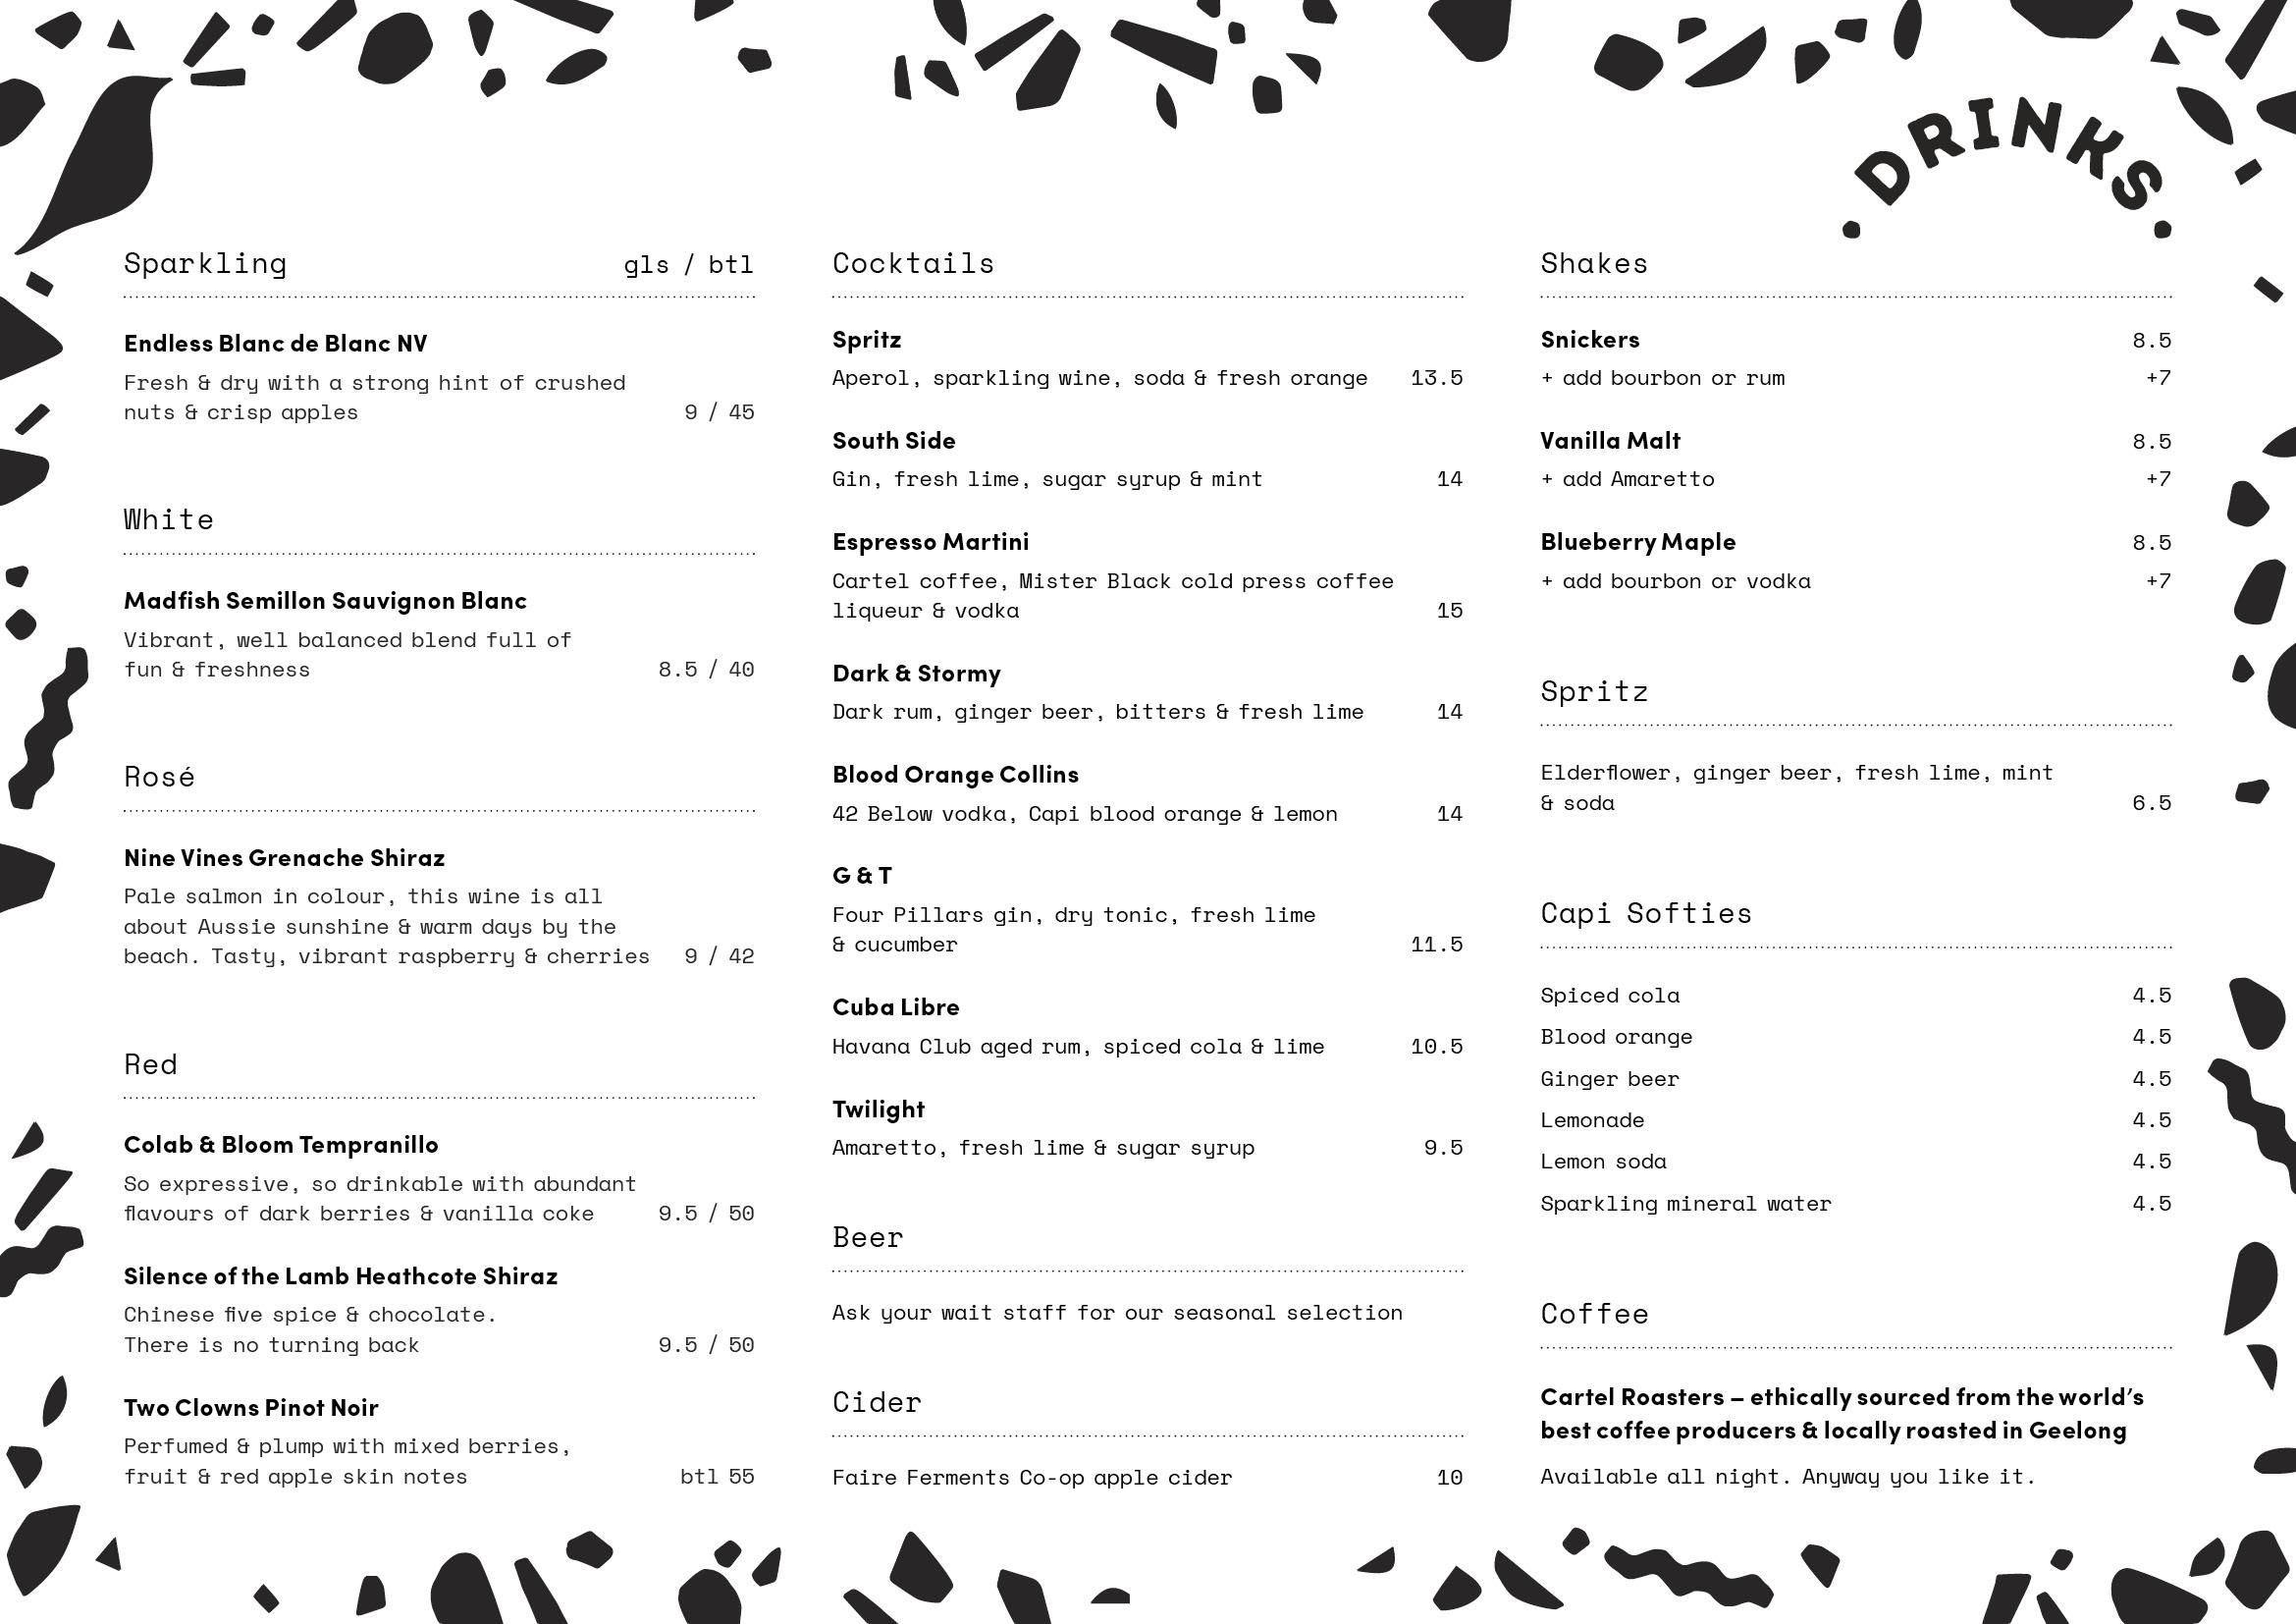 Bright-Burger-Menu-Online-2018-June-FA-Drinks.jpg